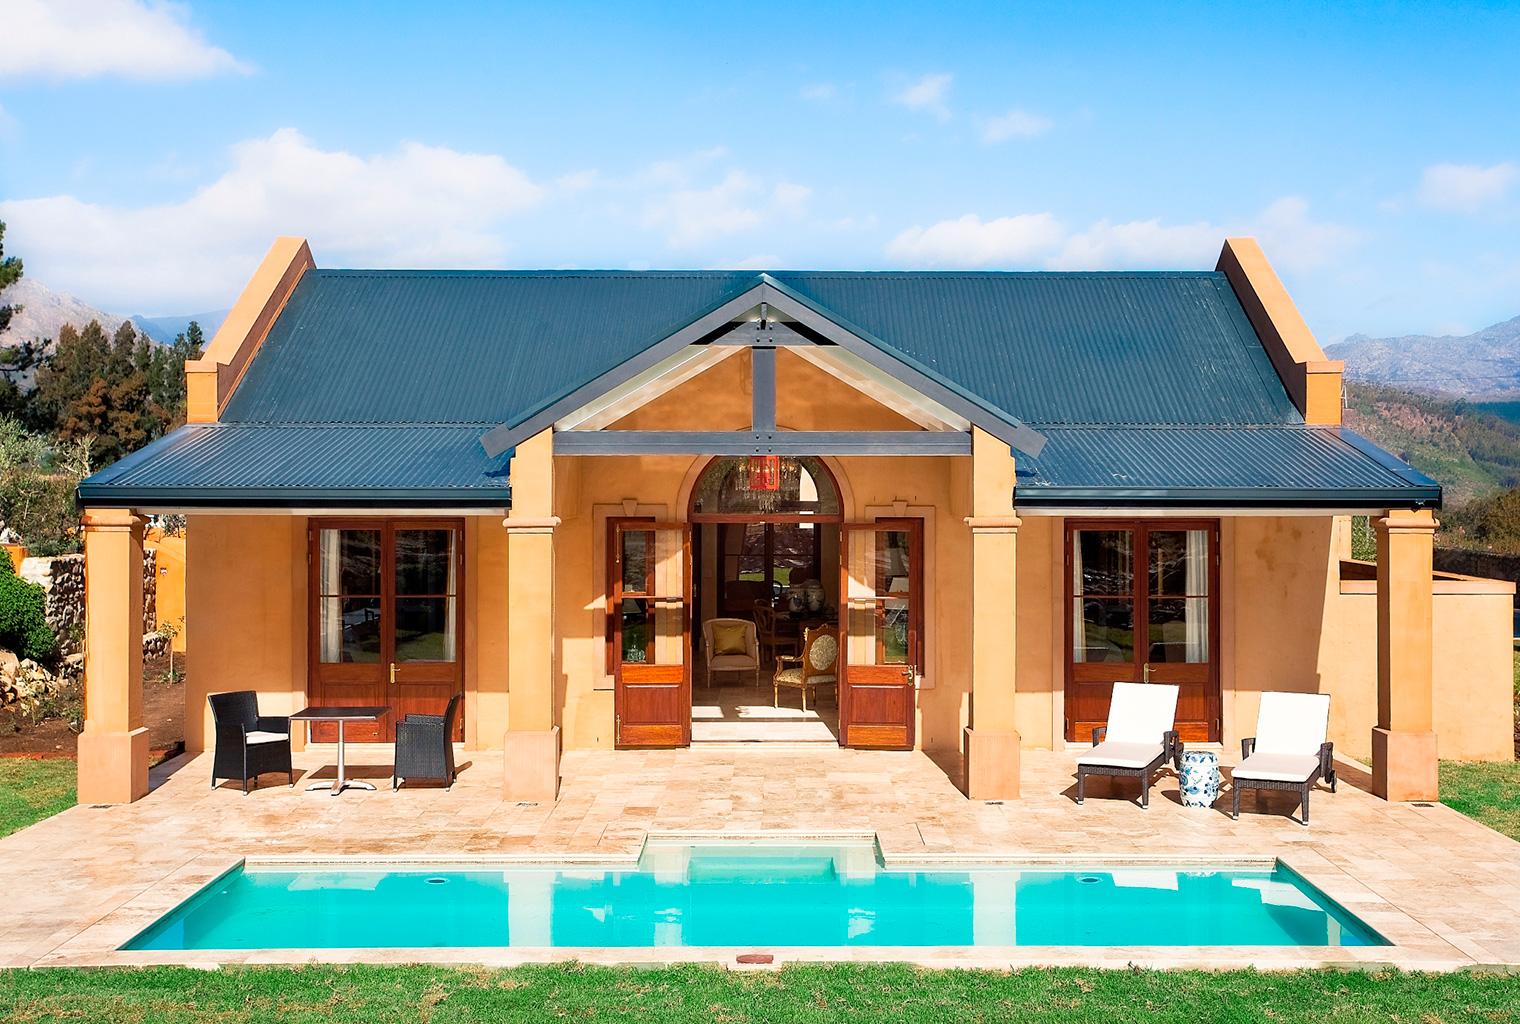 South-Africa, Winelands, La Residence, Villa Exterior